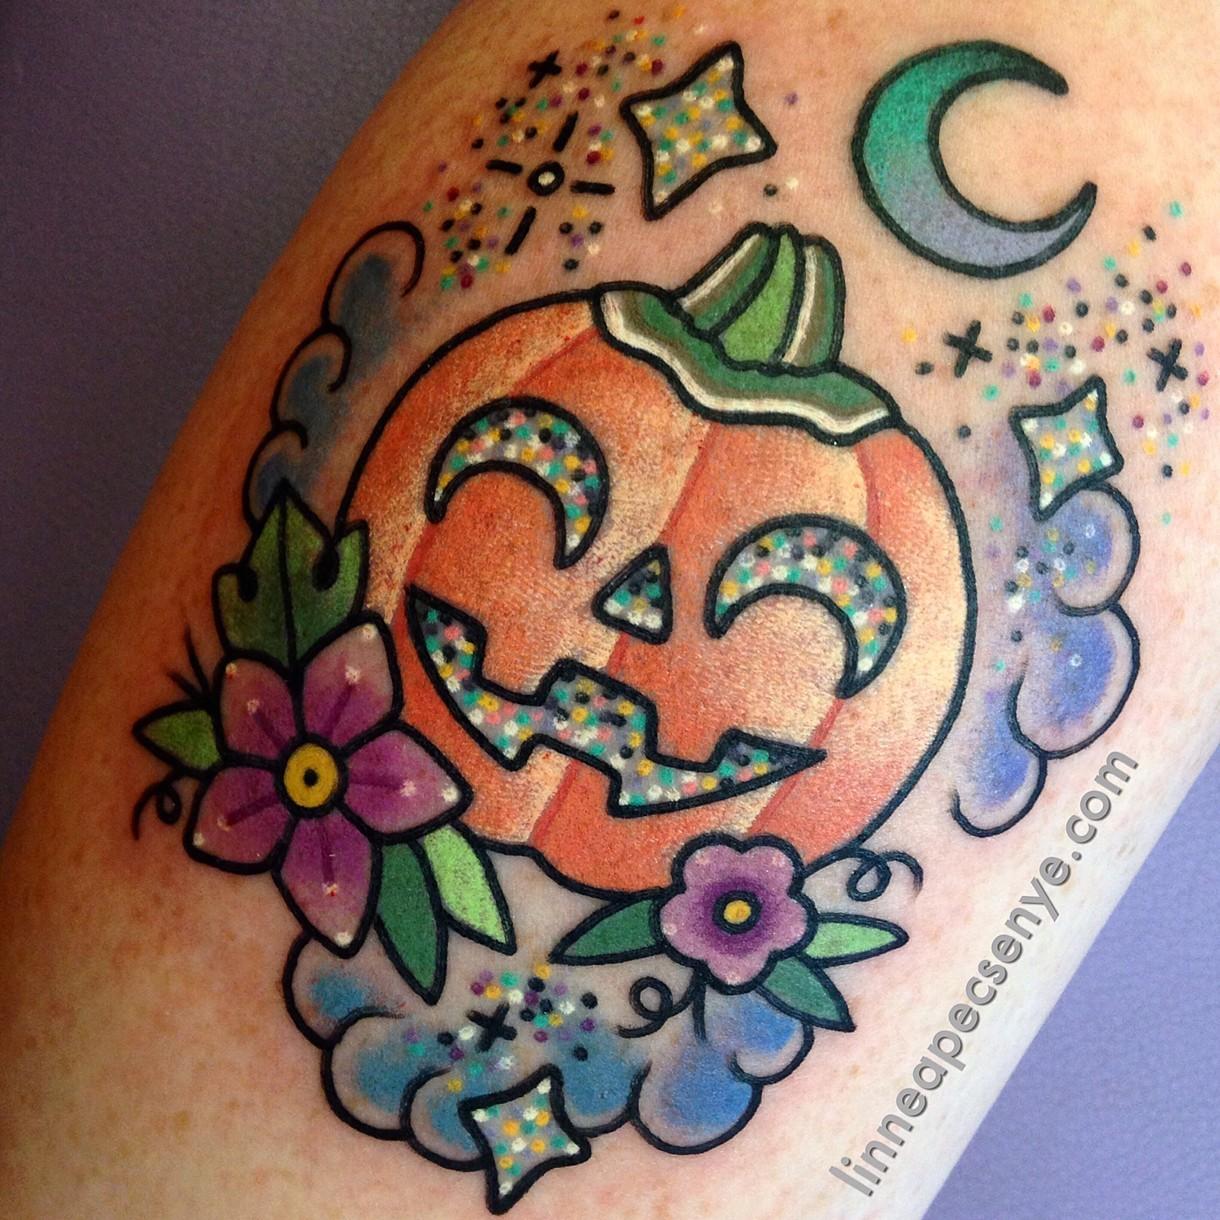 35 Awesome Halloween Tattoos